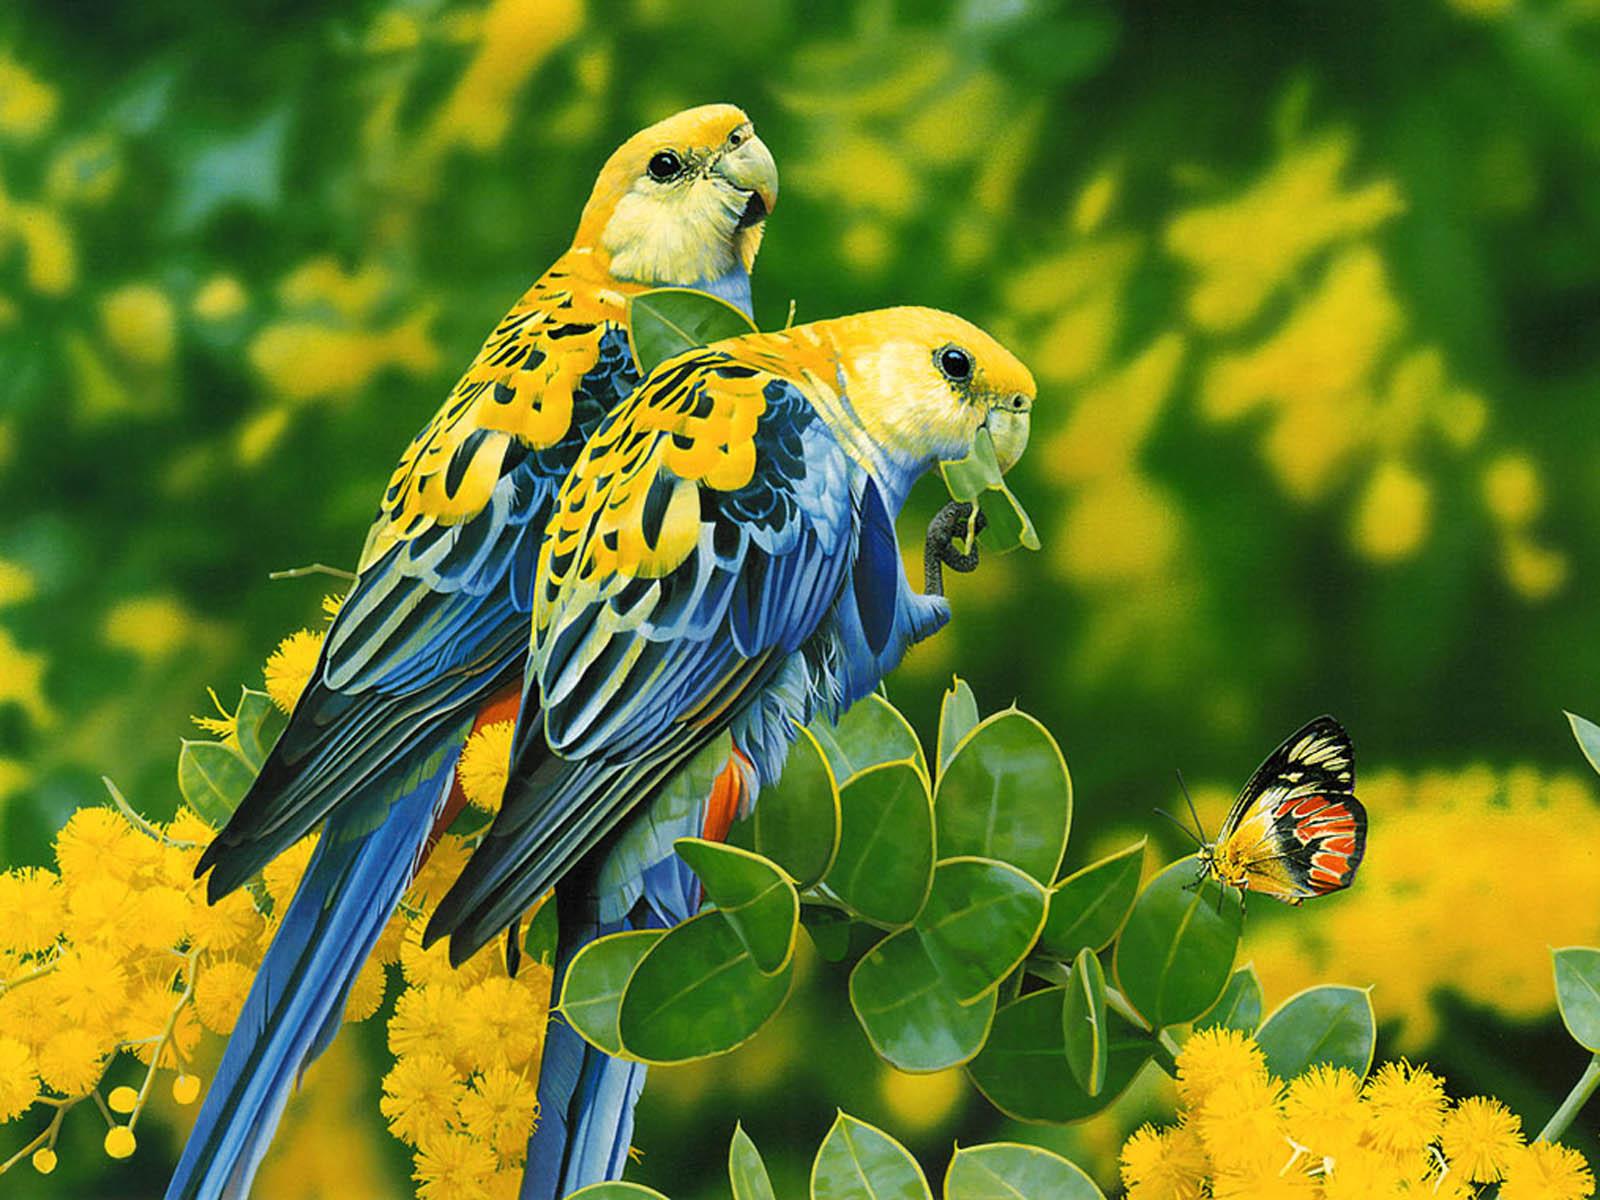 cool birds wallpaper - photo #29